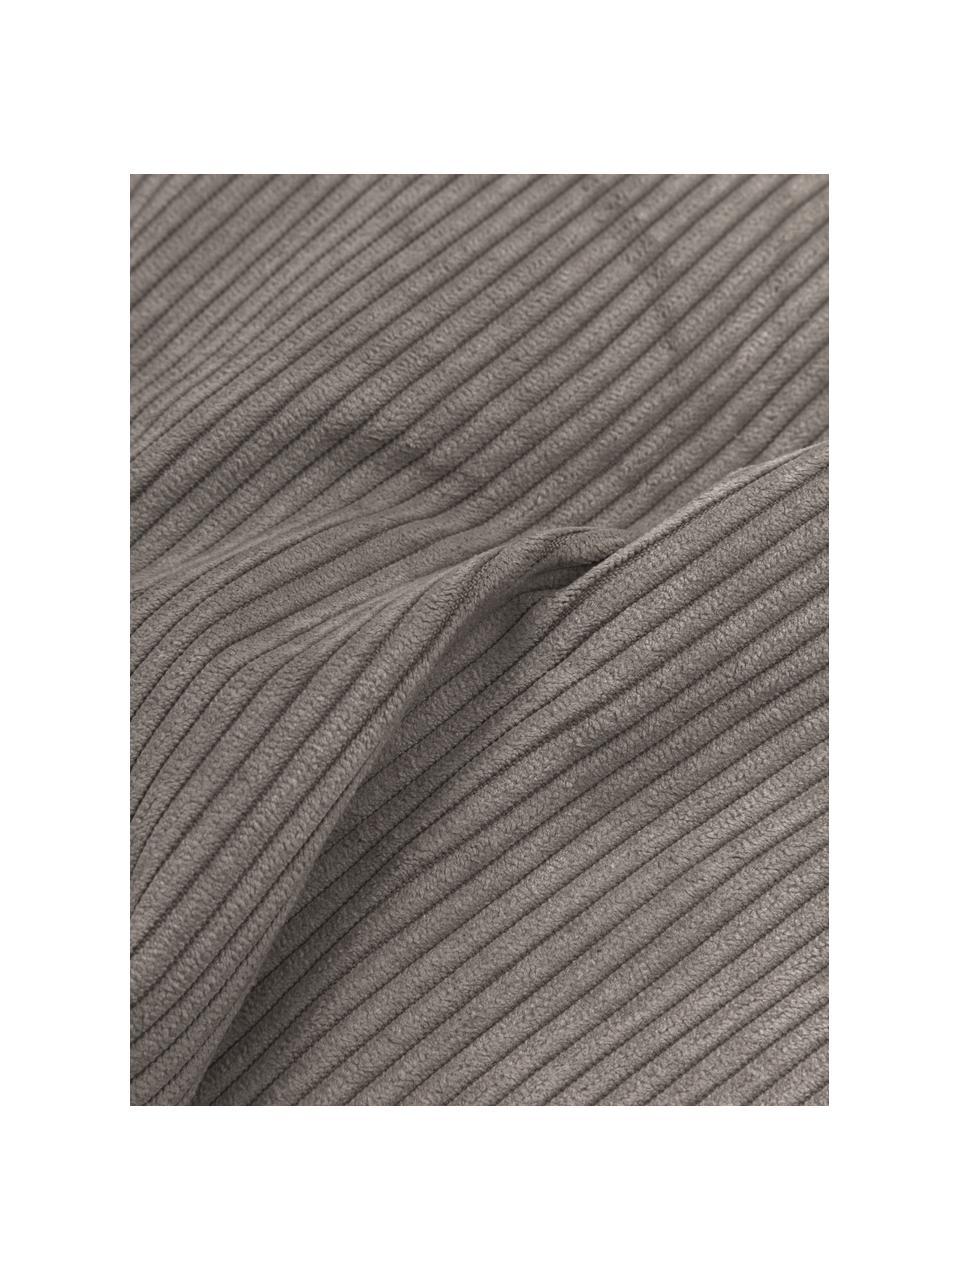 Sofa-Kissen Lennon in Braun aus Cord, Bezug: Cord (92% Polyester, 8% P, Cord Braun, 60 x 60 cm